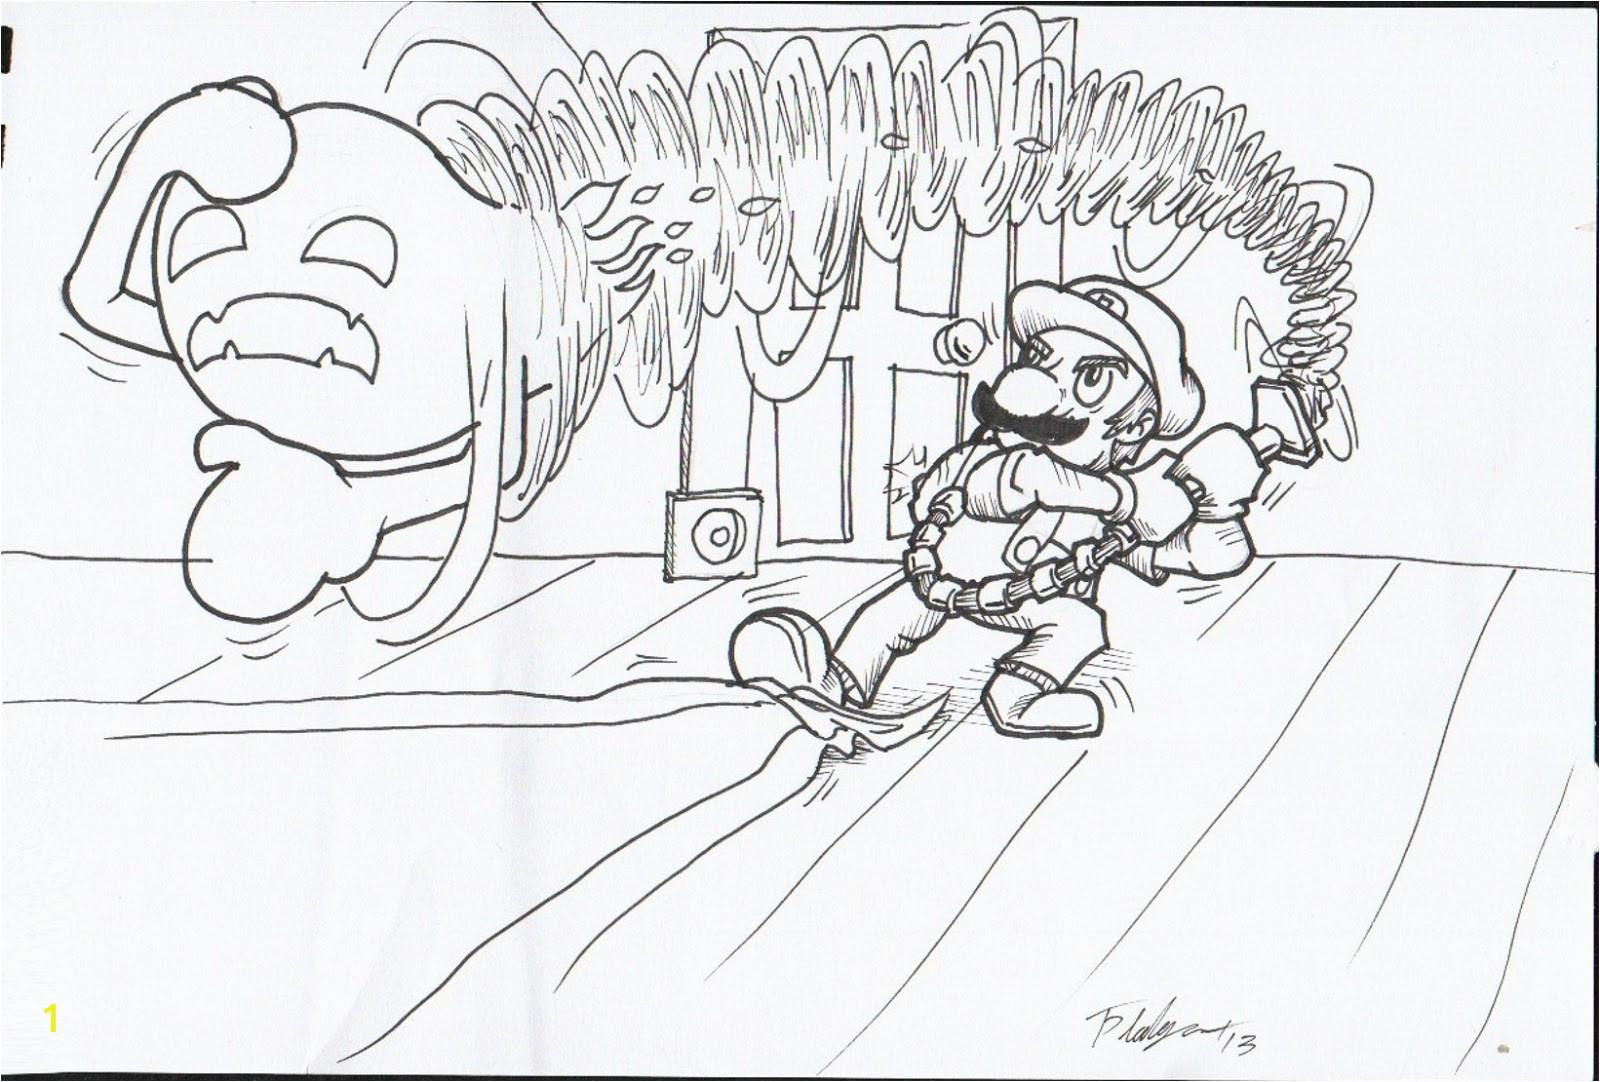 Luigi Mansion Dark Moon Coloring Pages Luigis Mansion Dark Moon Coloring Pages Coloring Pages